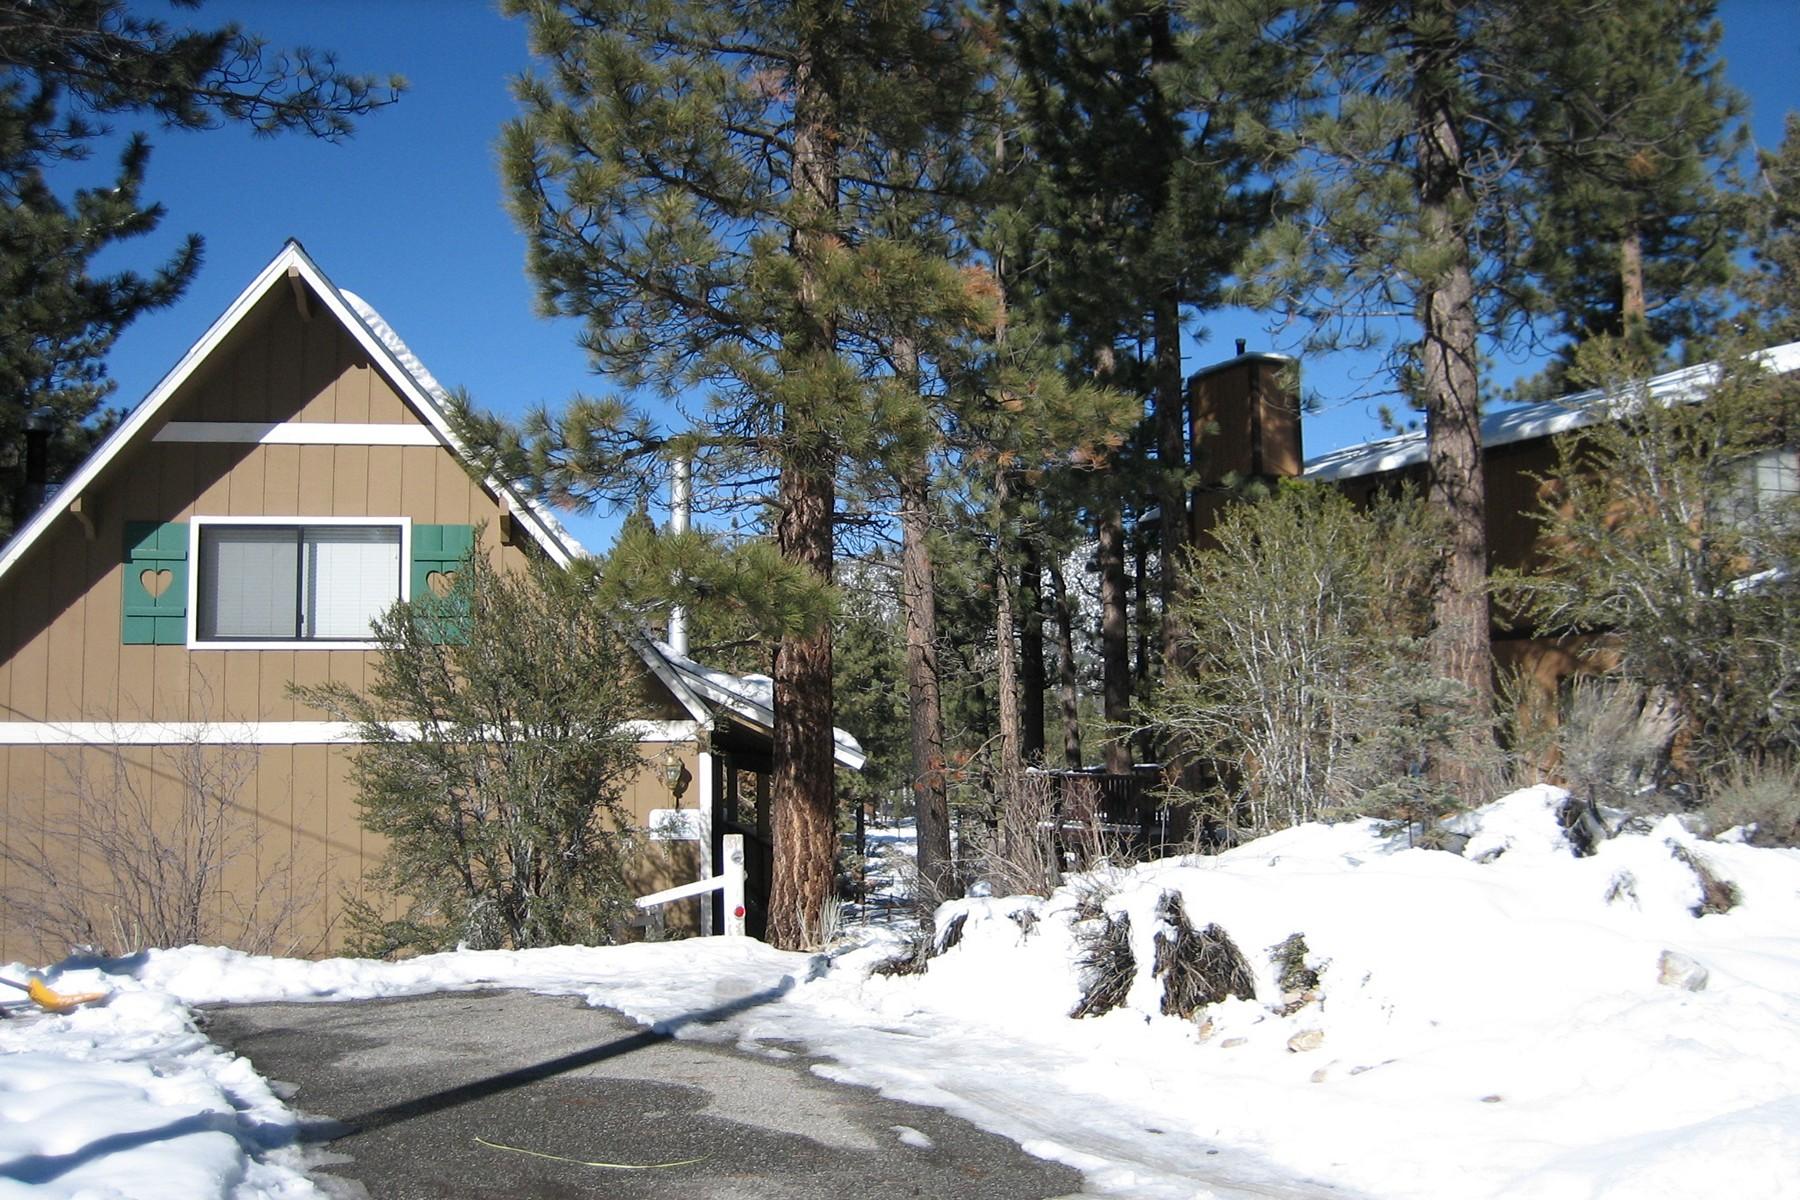 Single Family Home for Sale at Big Bear 1017 London Lane Big Bear City, California 92315 United States